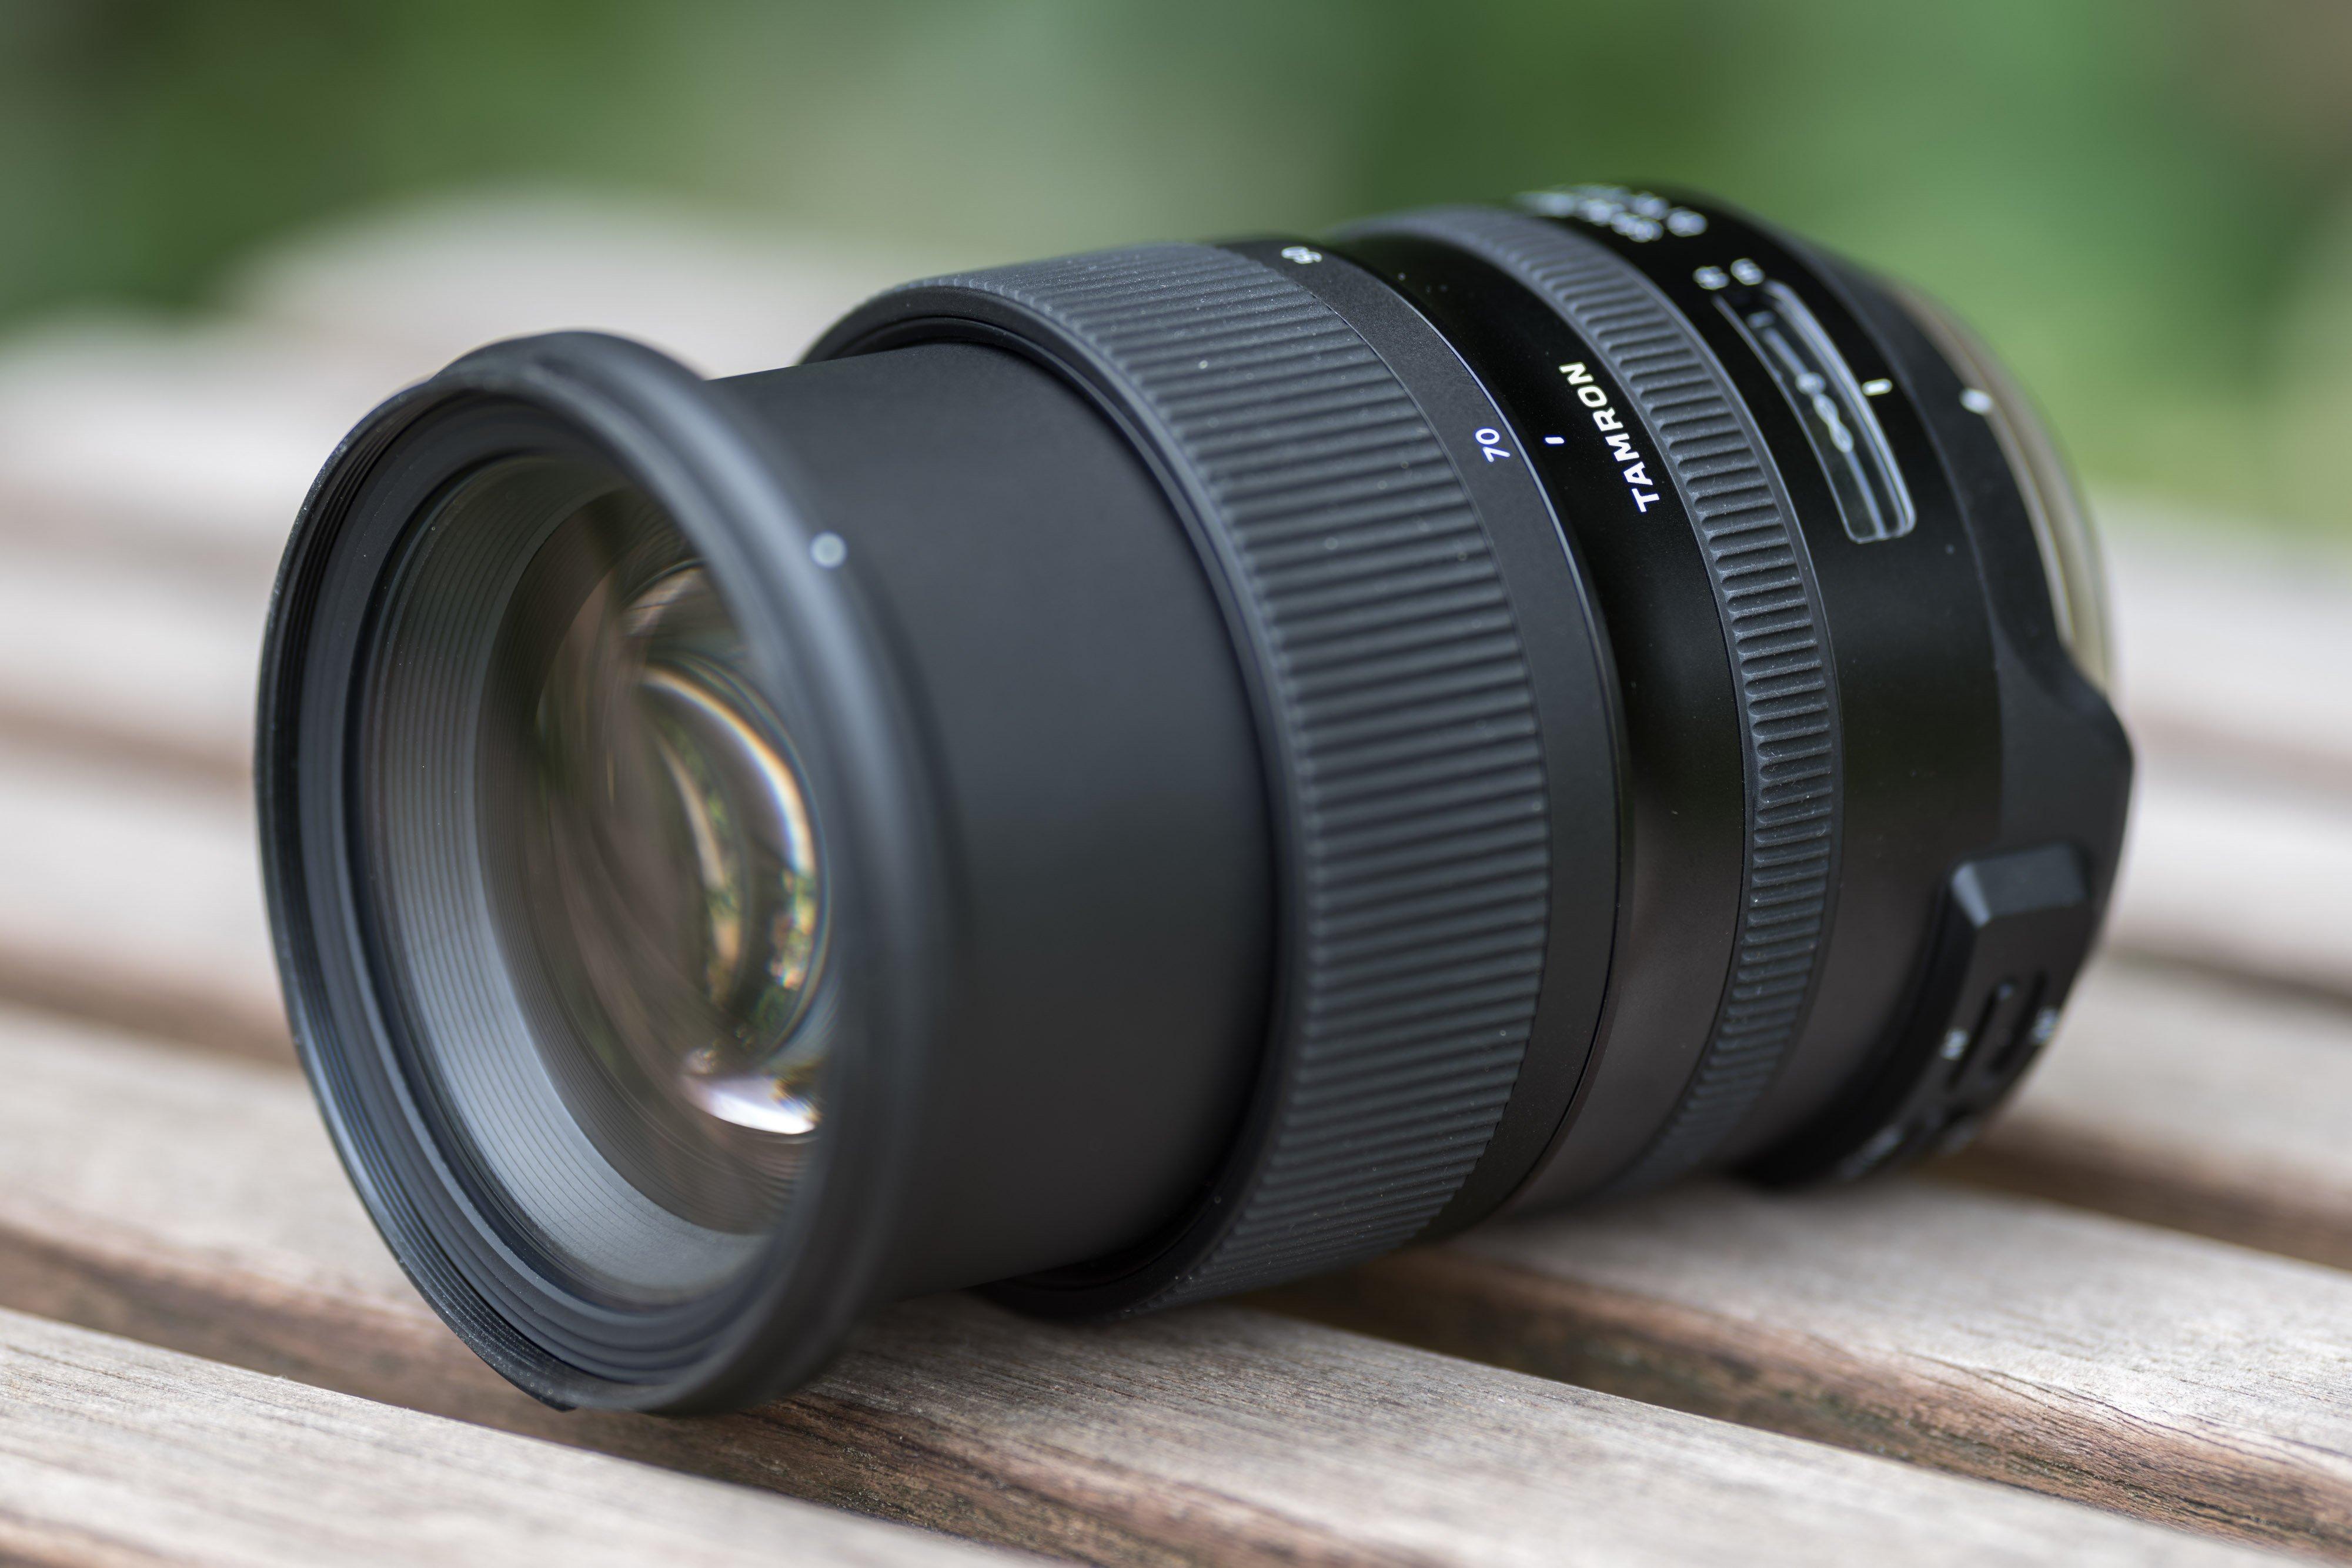 Wildlife Photographer's Review: Nikon 200-500mm f/5.6E ED Best lens for wildlife photography tamron